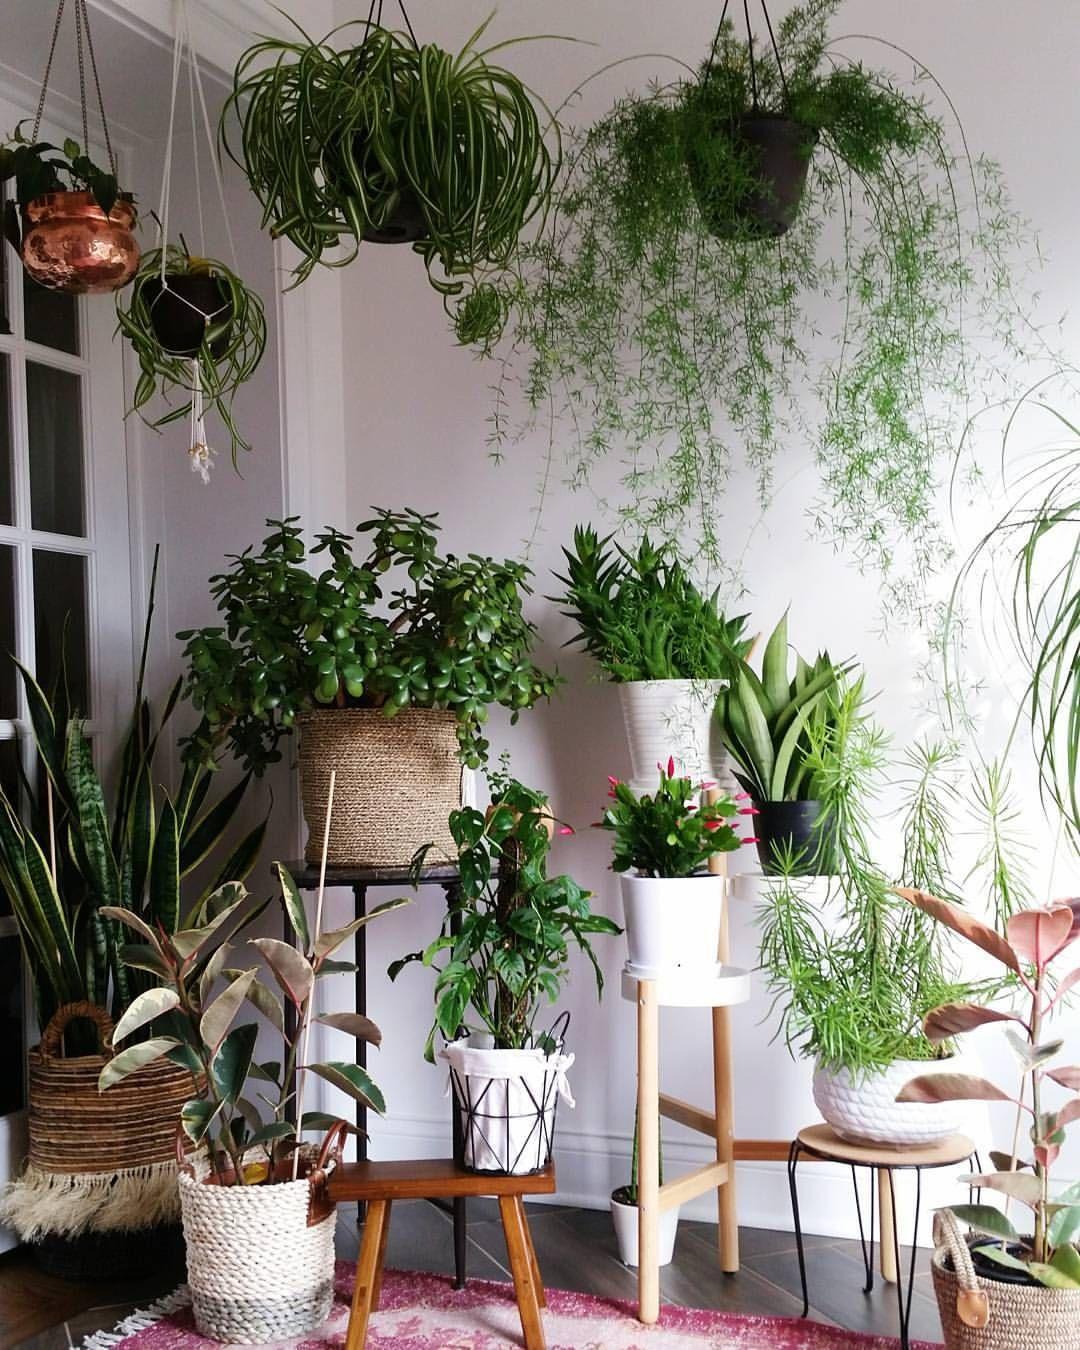 2 065 l t th ch 42 b nh lu n paula - Indoor plants decoration ideas ...